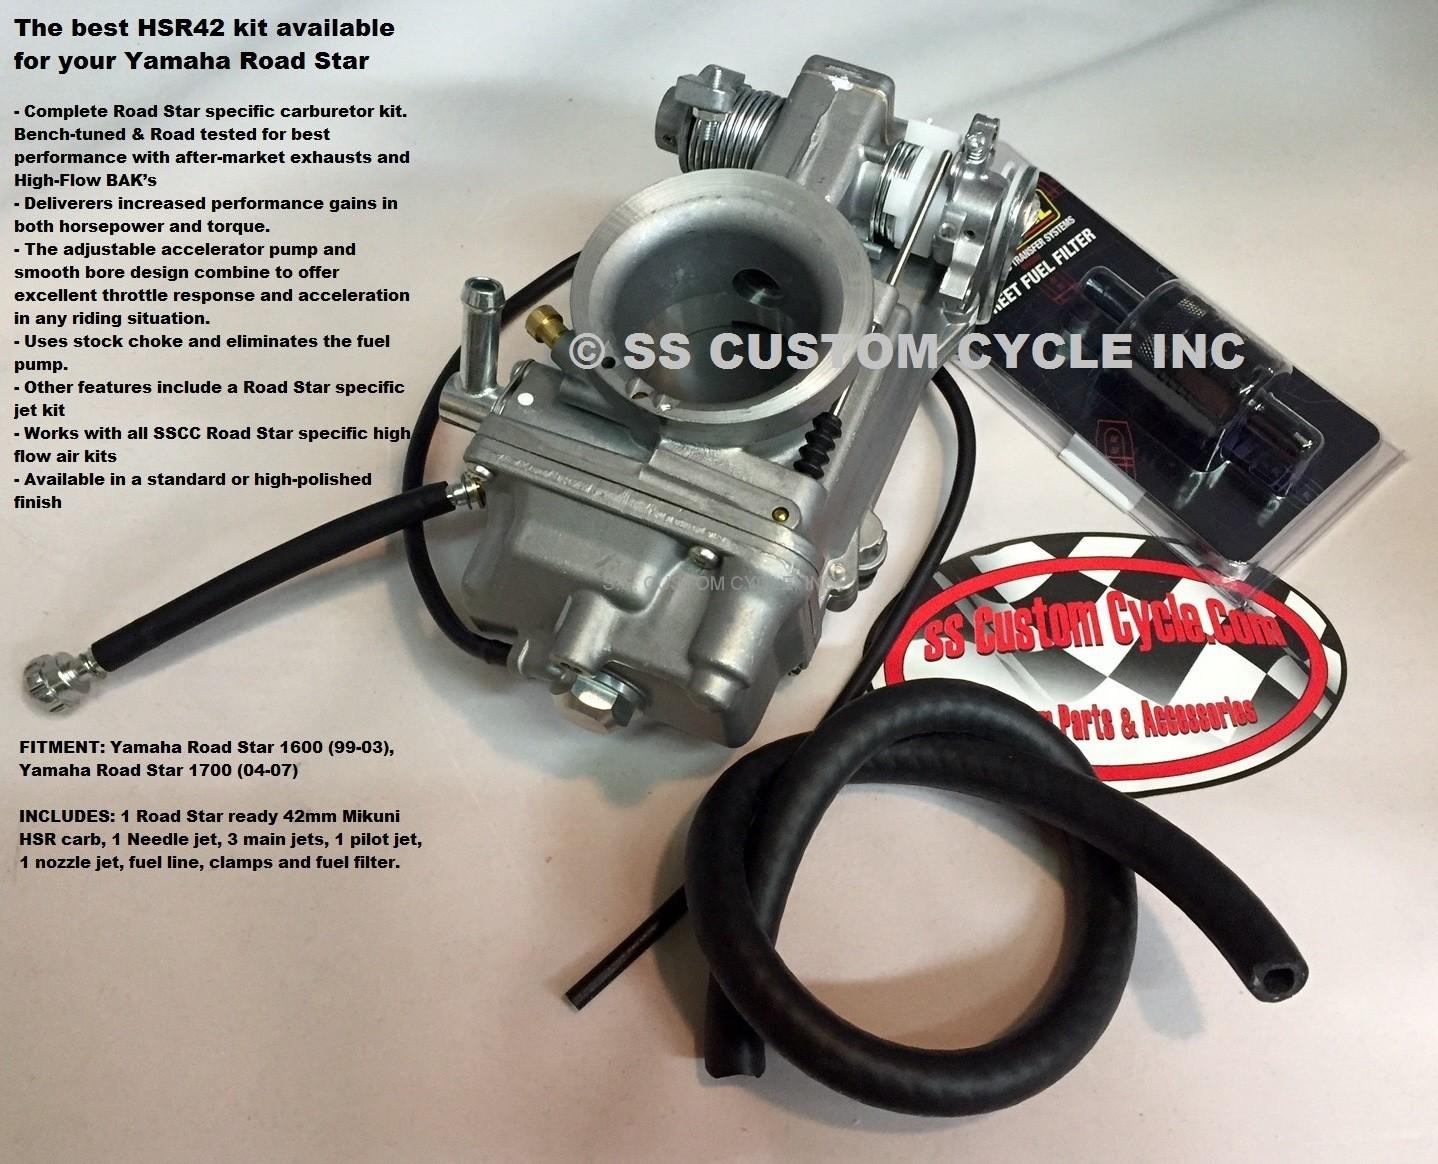 hight resolution of hsr 42 carburetor kit